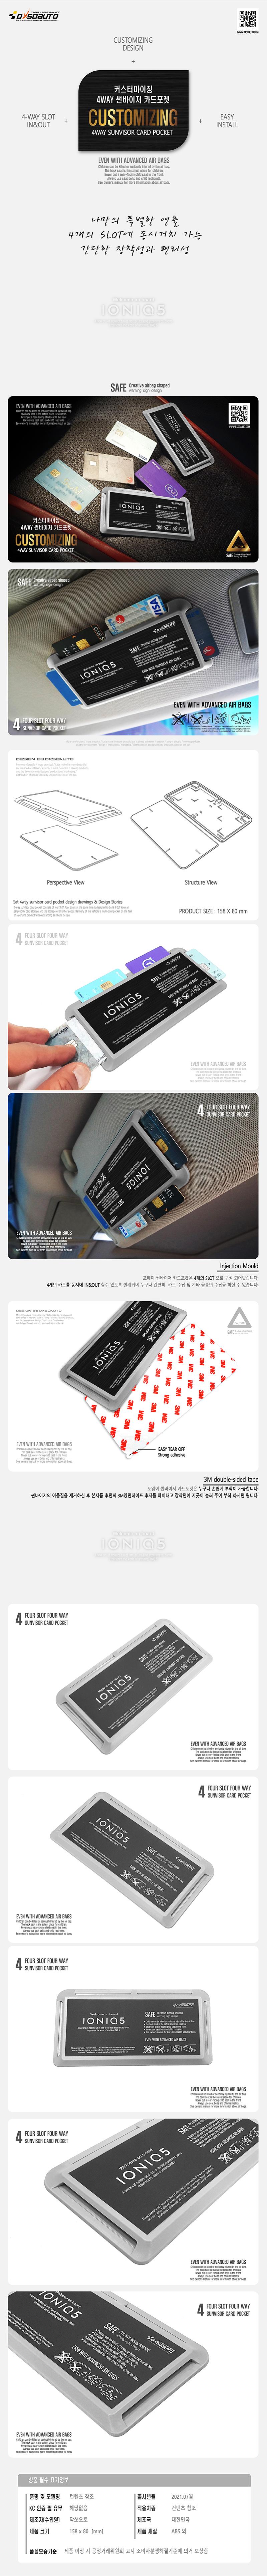 [DXSOAUTO] 커스터마이징 4WAY 썬바이저 카드포켓 (1EA / 1SET) 아이오닉5 실버